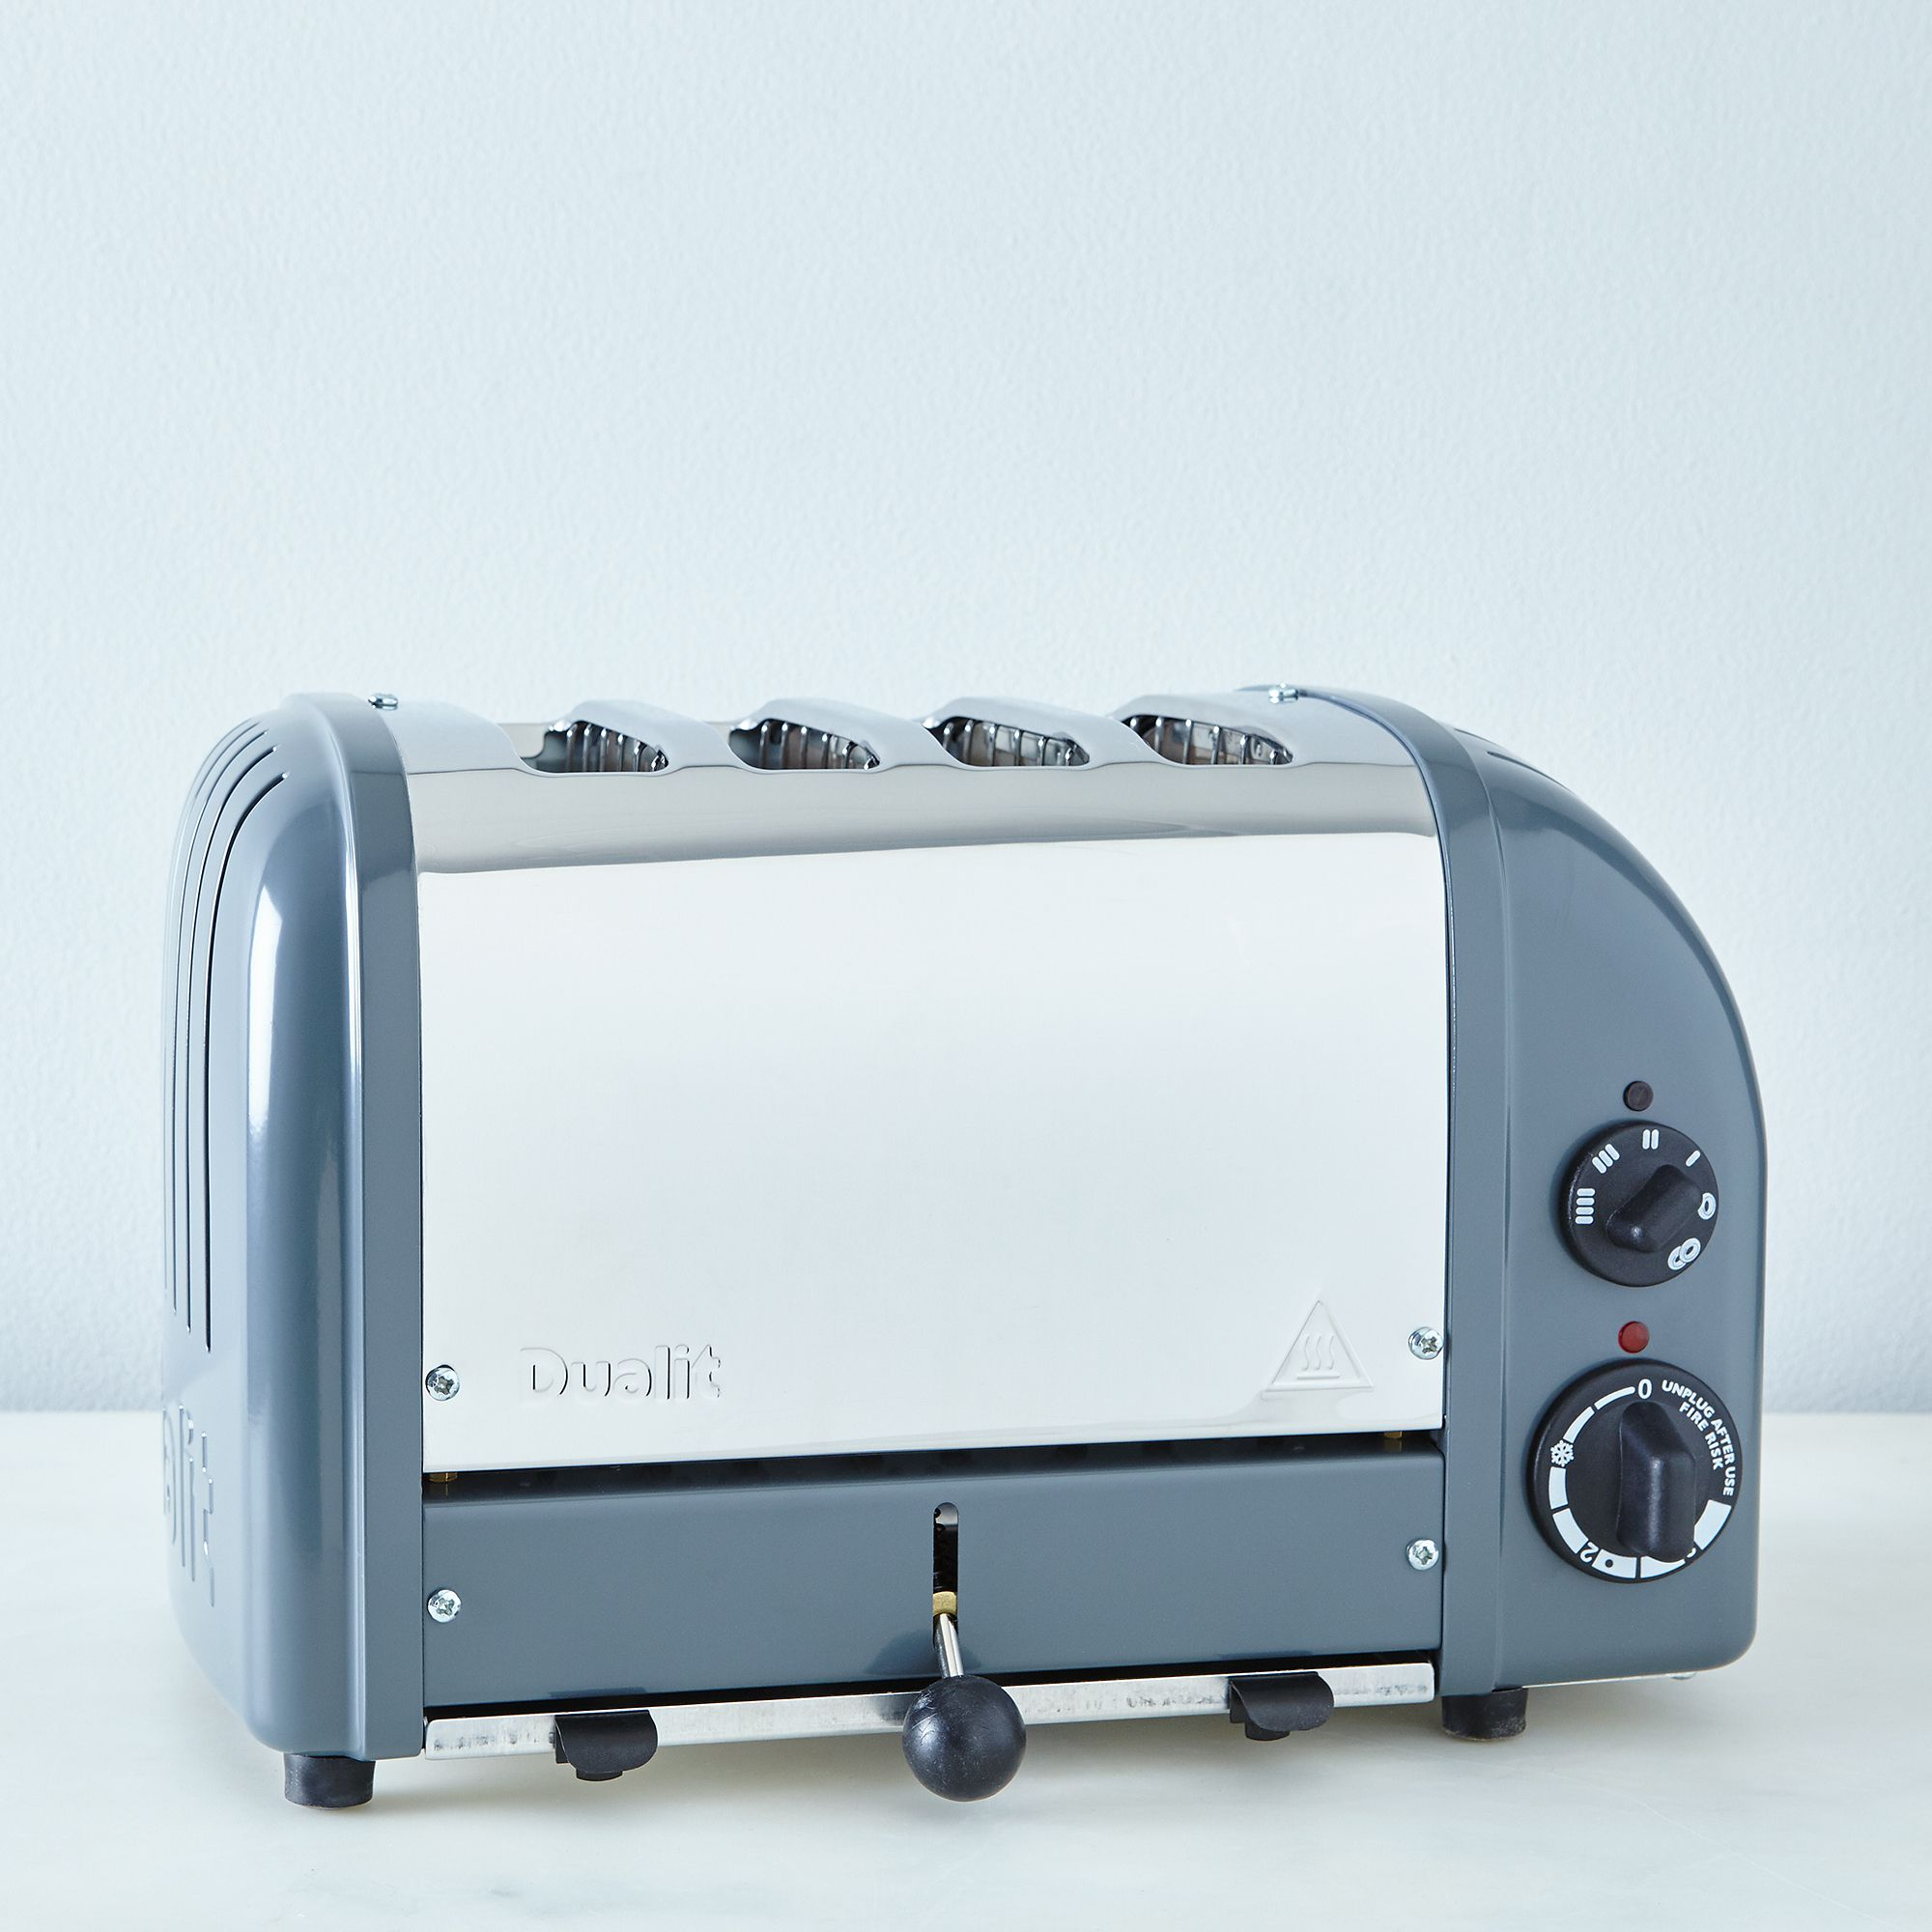 Ec87fa9a 7d14 46d5 bd24 eec7379fc399  2016 0513 dualit toaster cobble grey 4 slice silo rocky luten 004